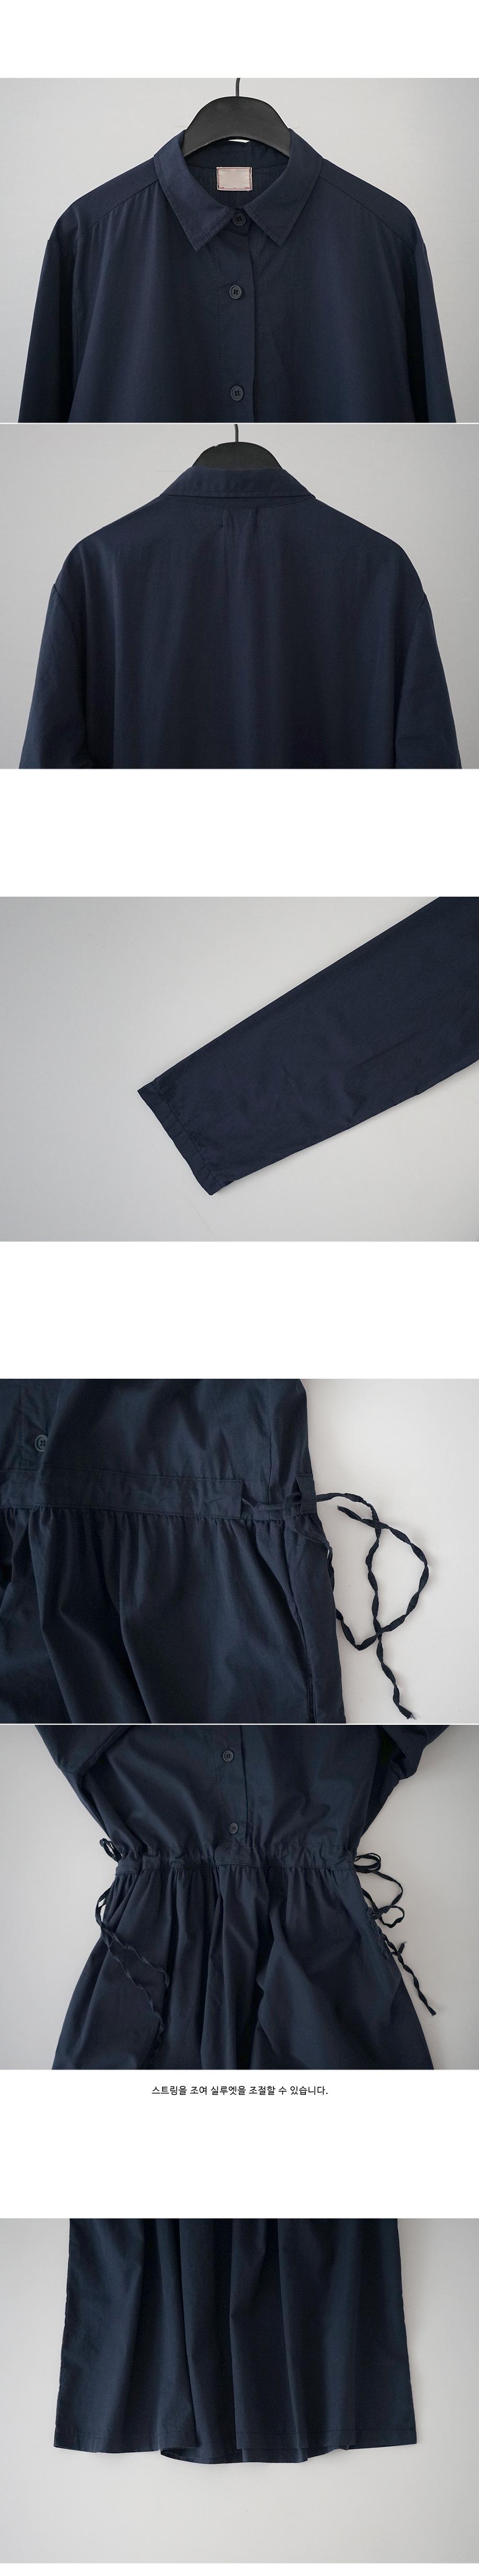 tidy waist string ops